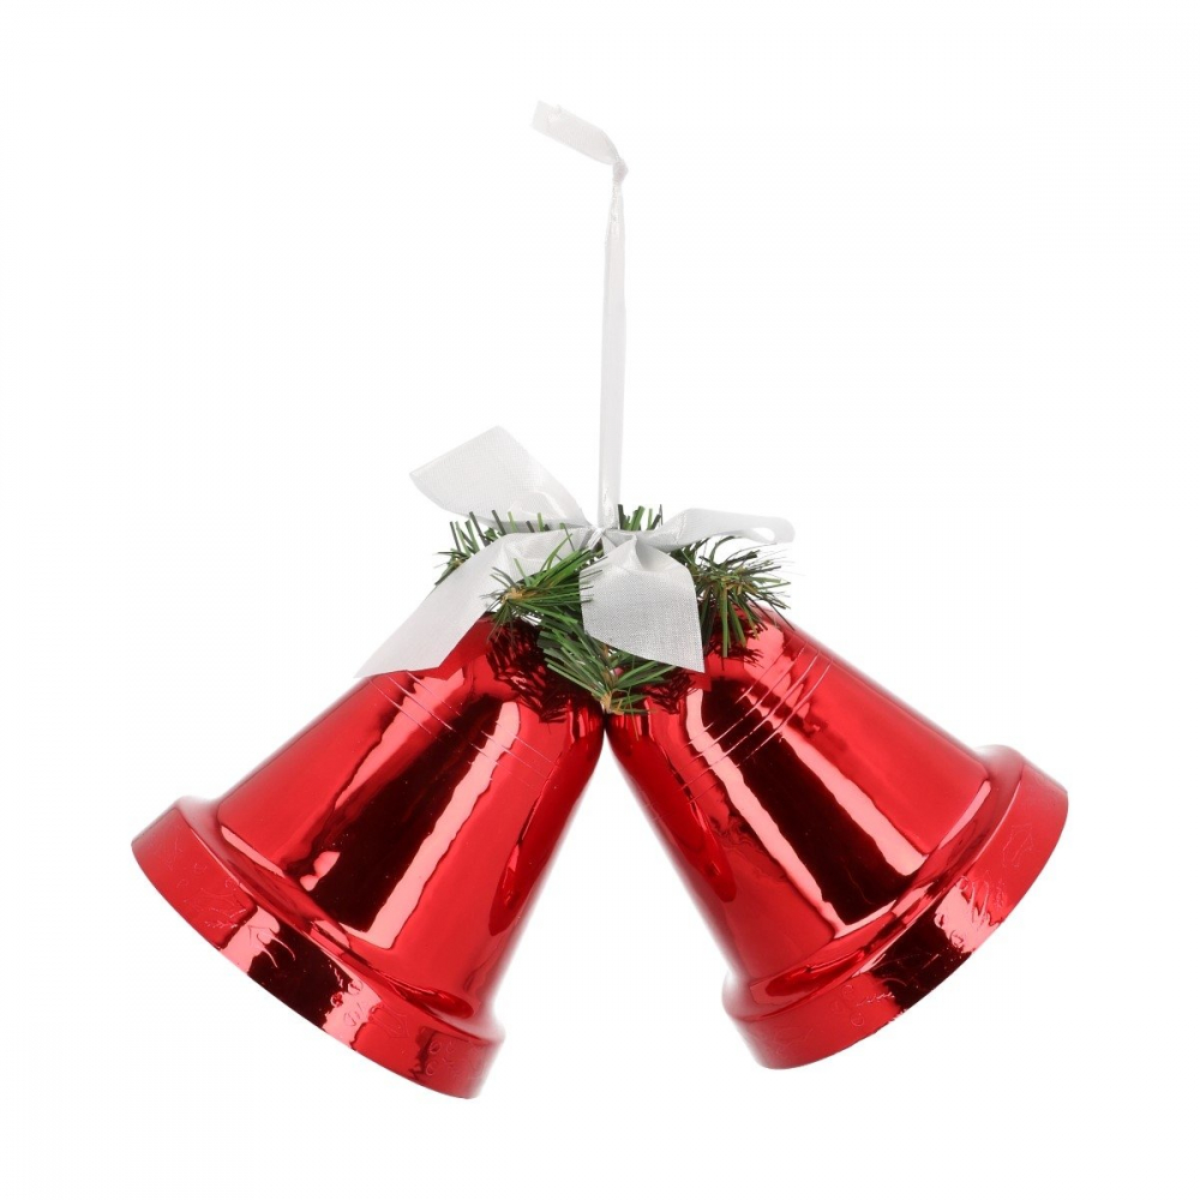 Plastic kerstklokken - 15 cm - Rood - 2 stuks